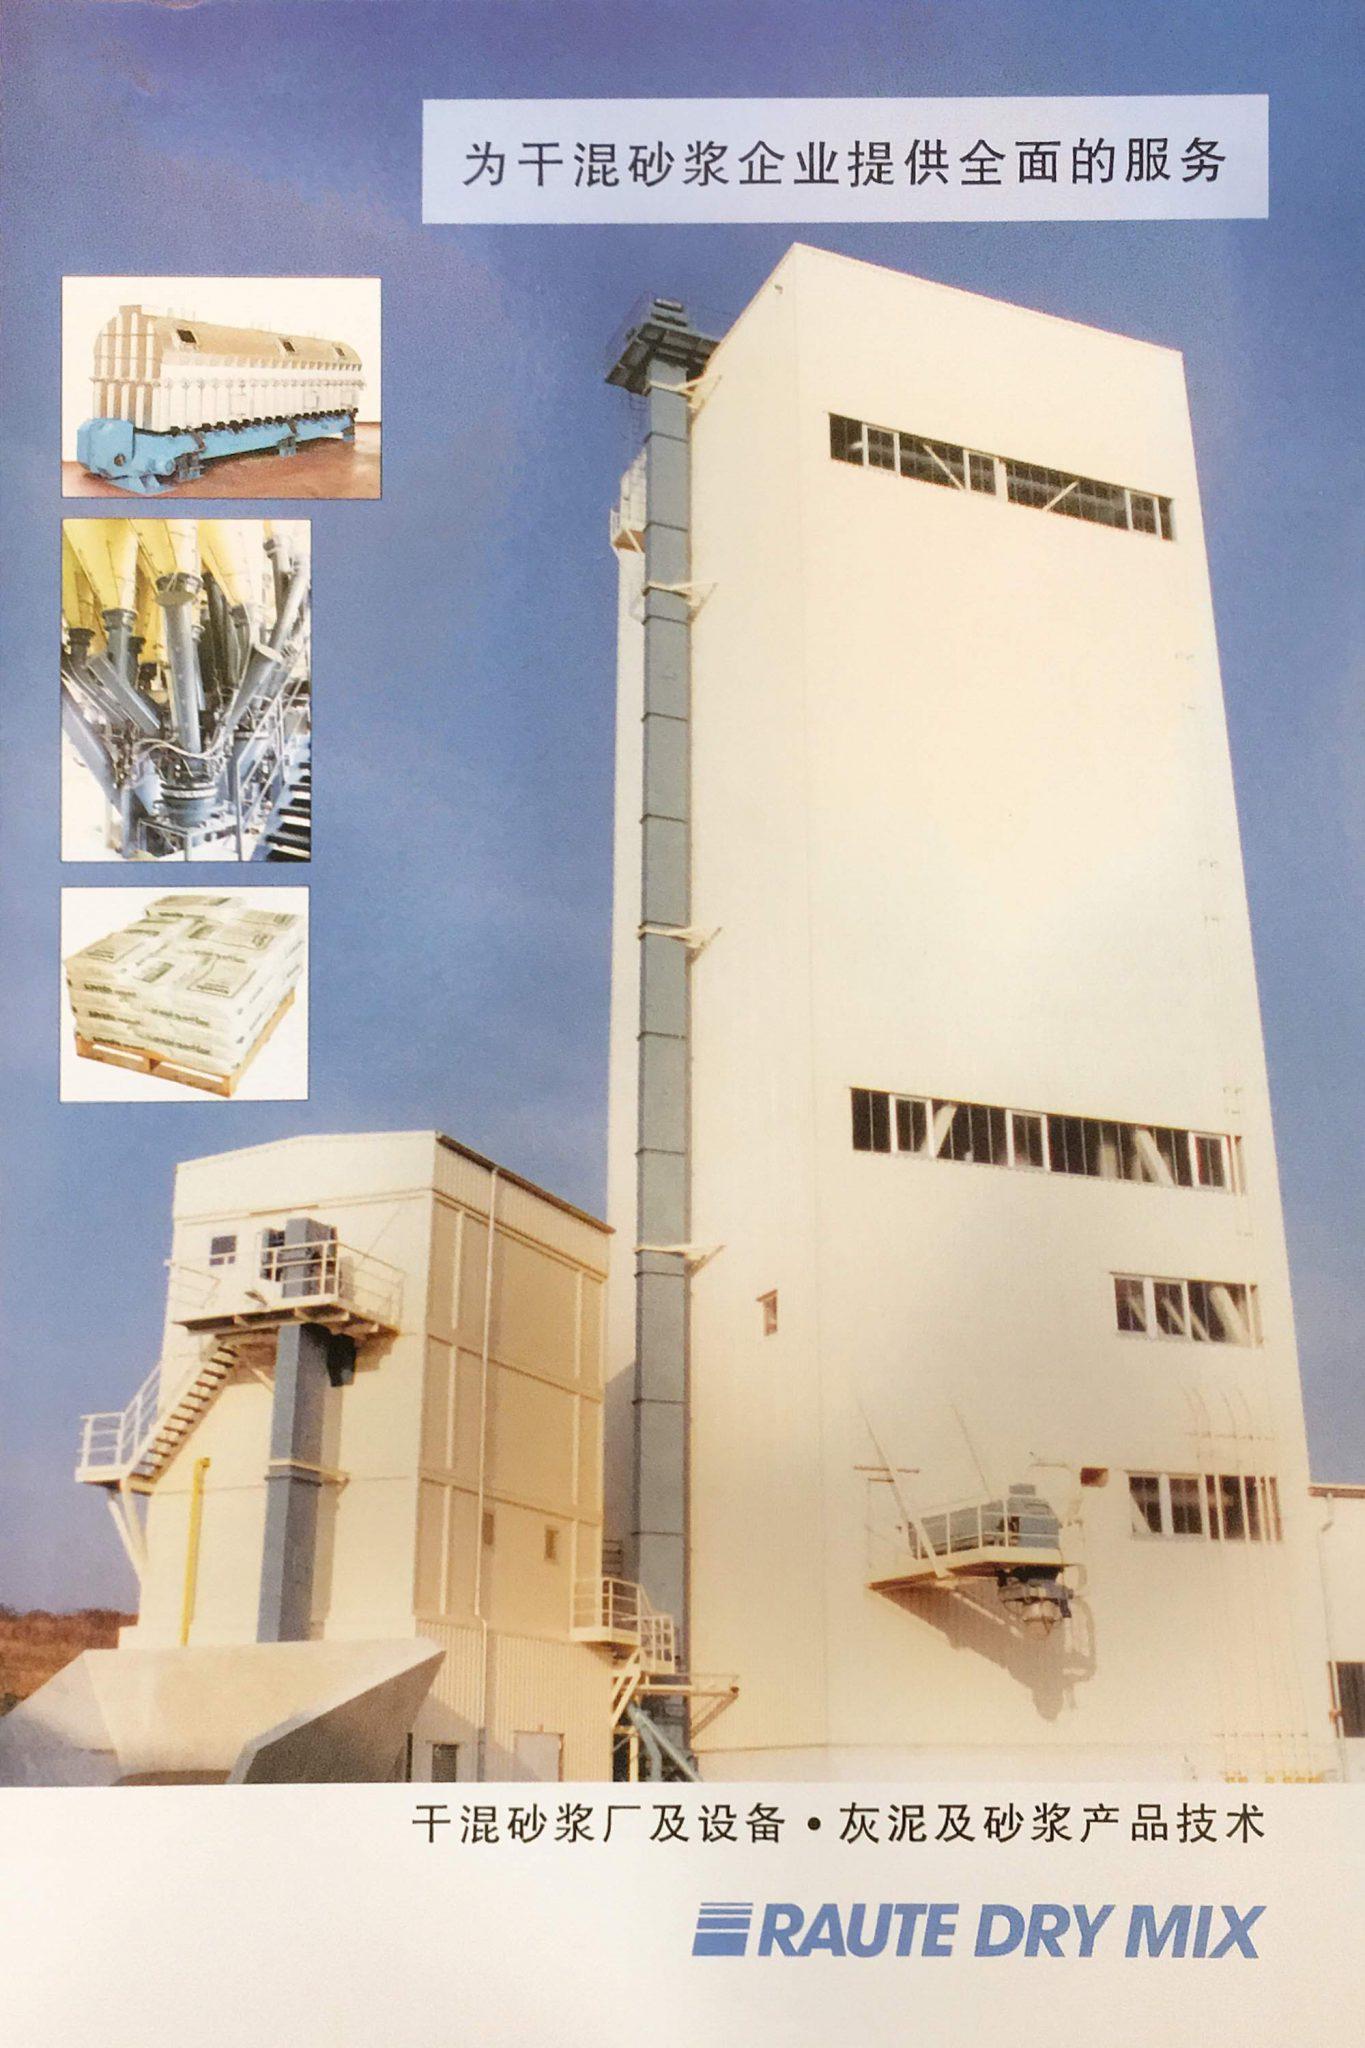 tekway-company-leaflets-brochures-raute